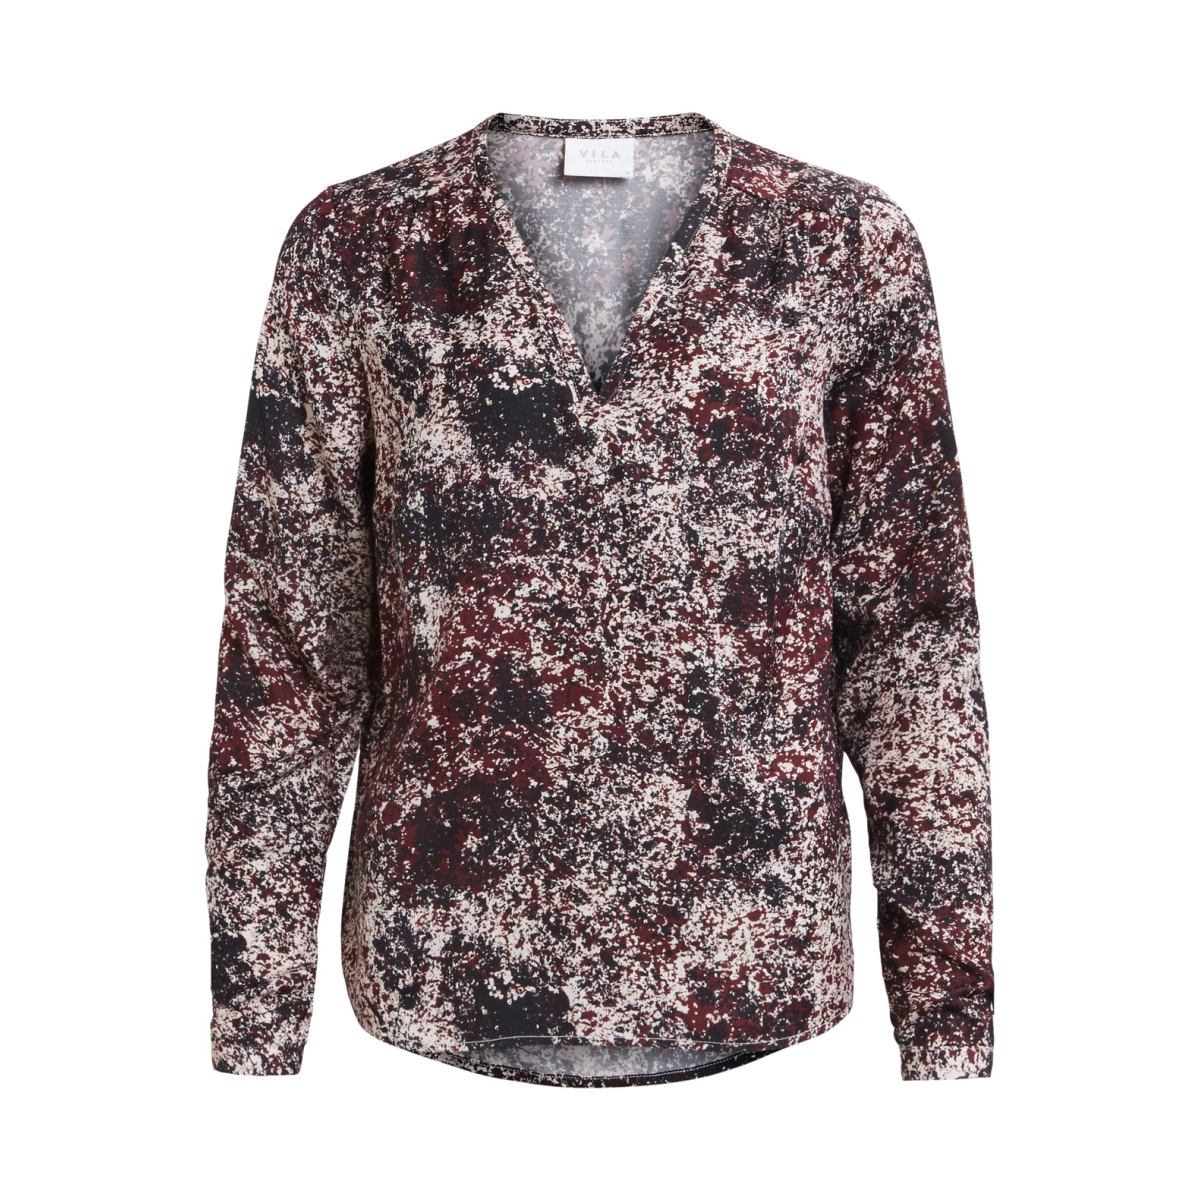 vicava l/s v-neck top-fav 14043501 vila blouse cabernet/vispotties